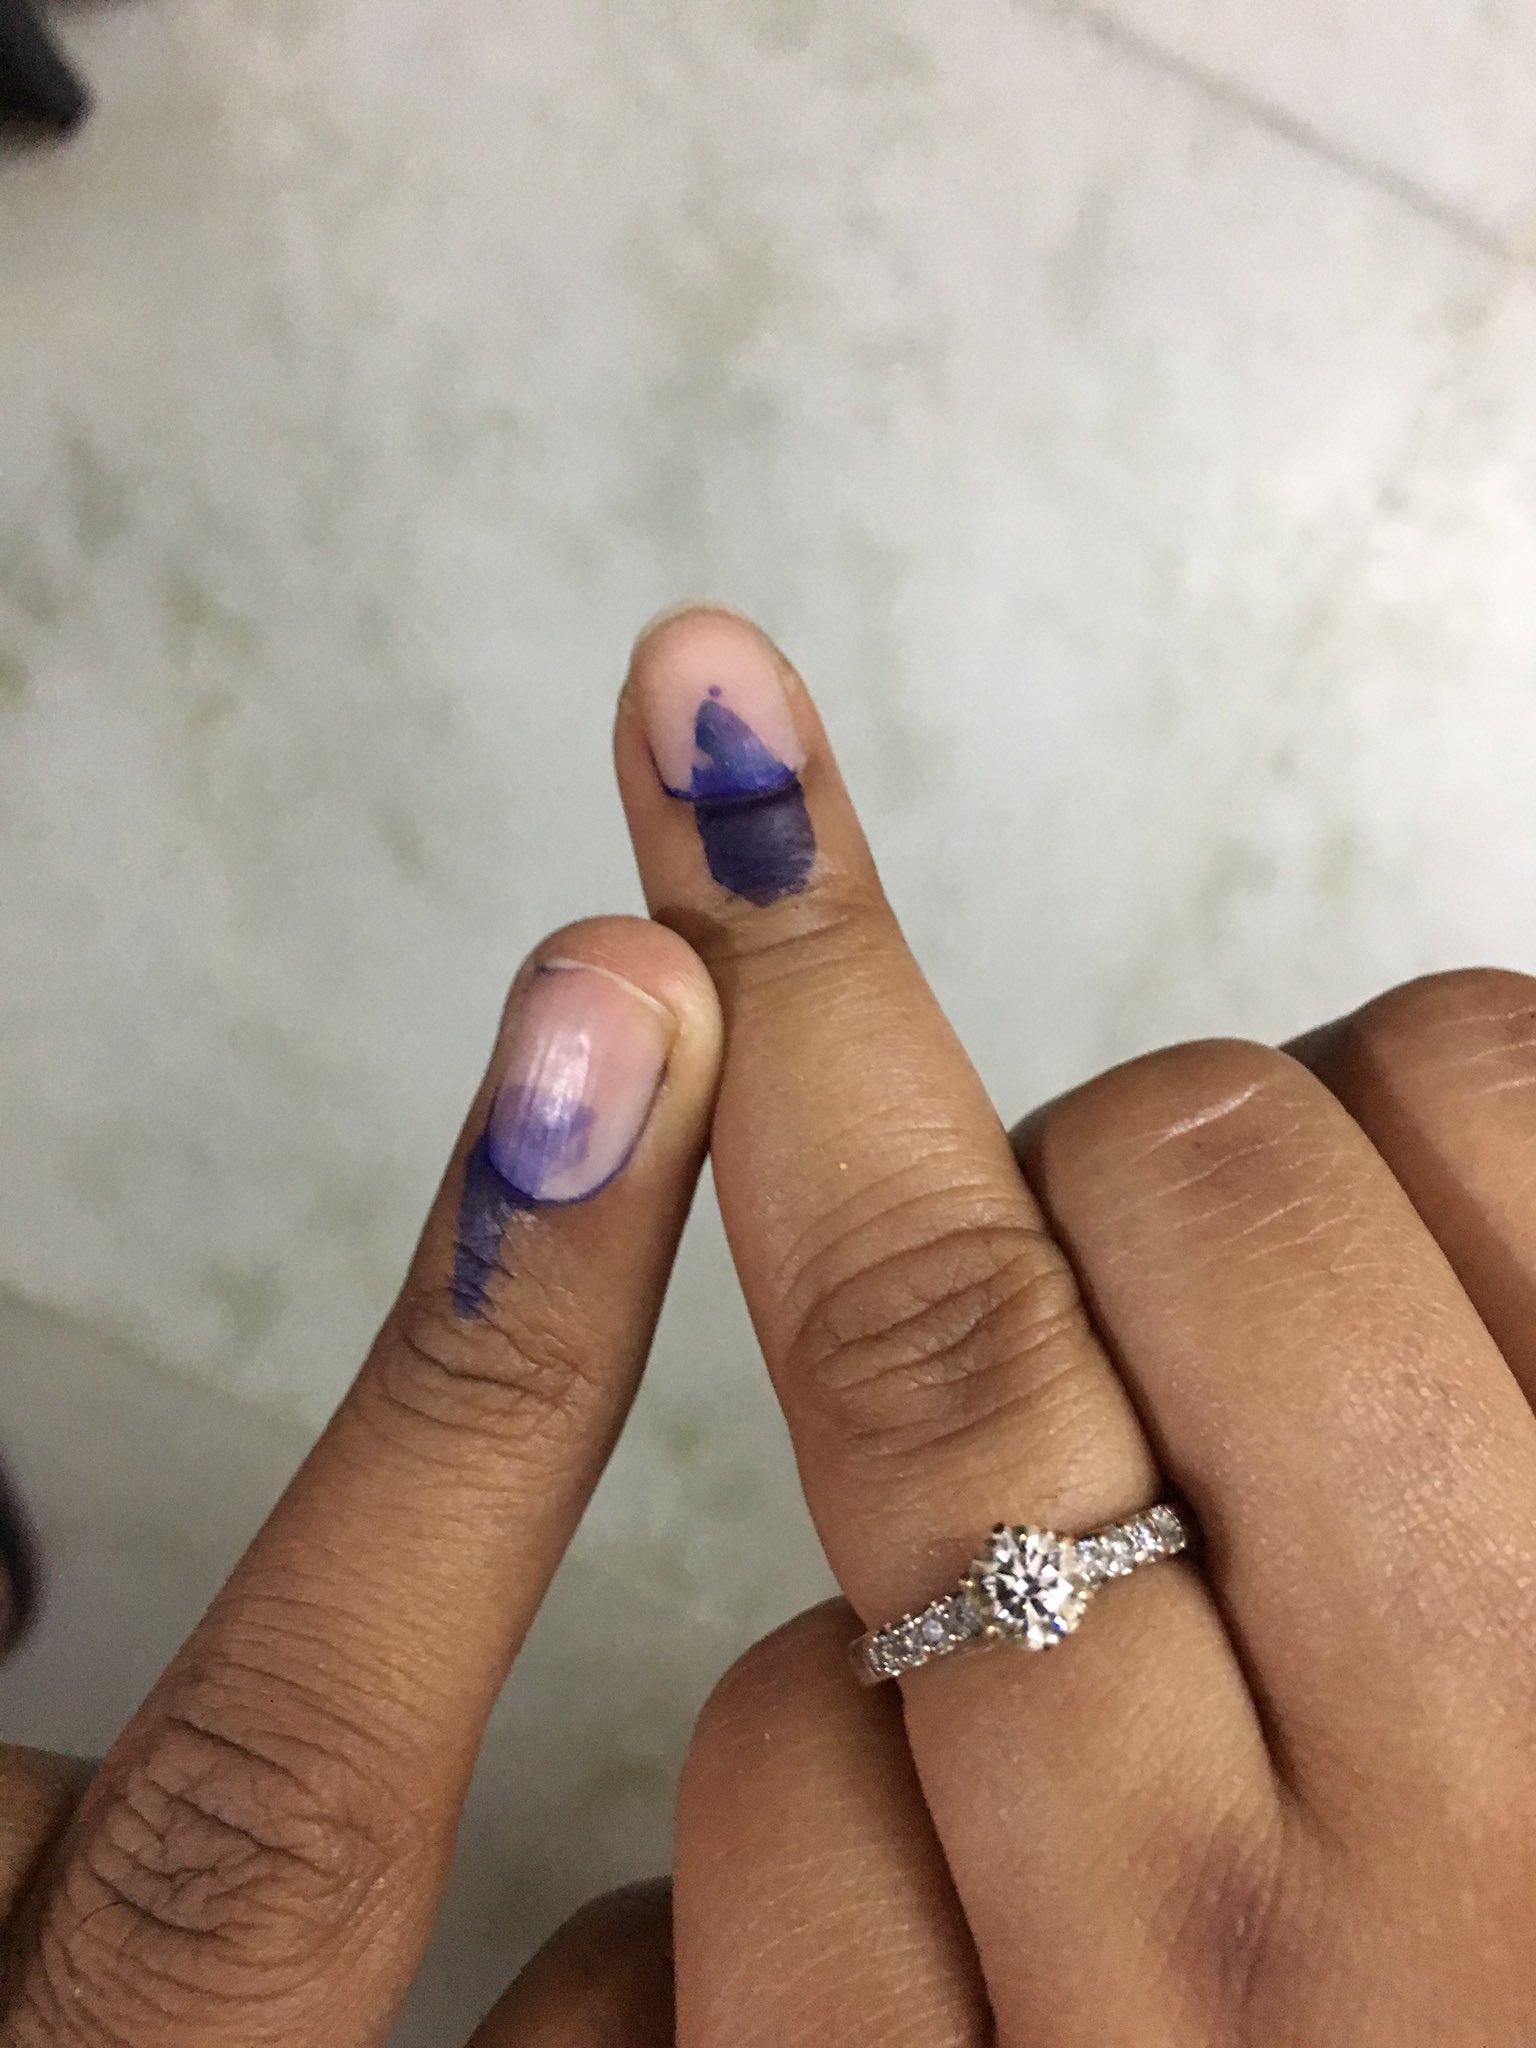 #MCDelections2017 Check. Hoping whosoever wins take concrete steps to clean delhi. #DelhiVotes ���� https://t.co/PRm2TFQgFF